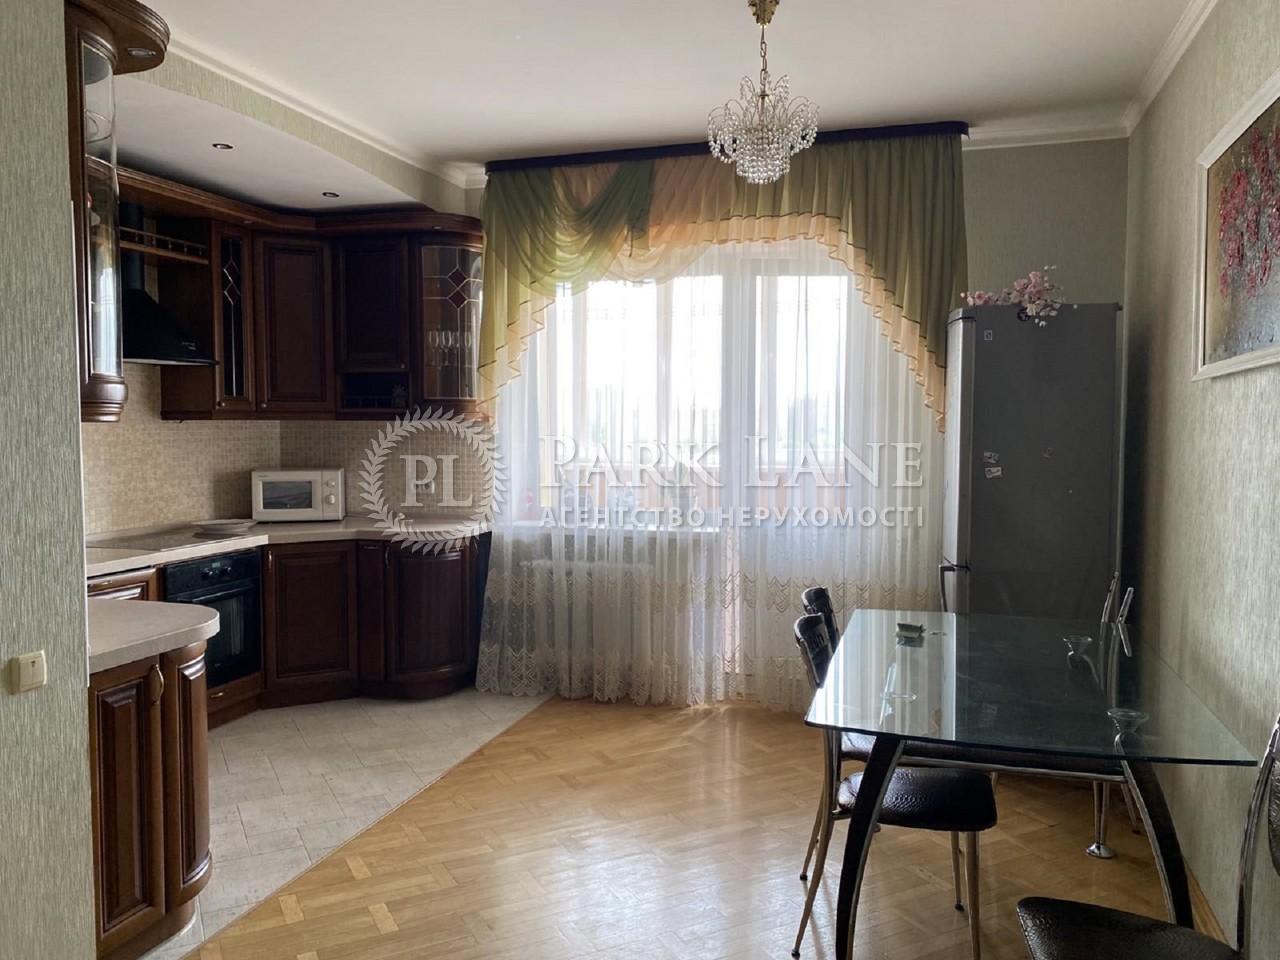 Квартира ул. Драгоманова, 31б, Киев, R-39564 - Фото 6